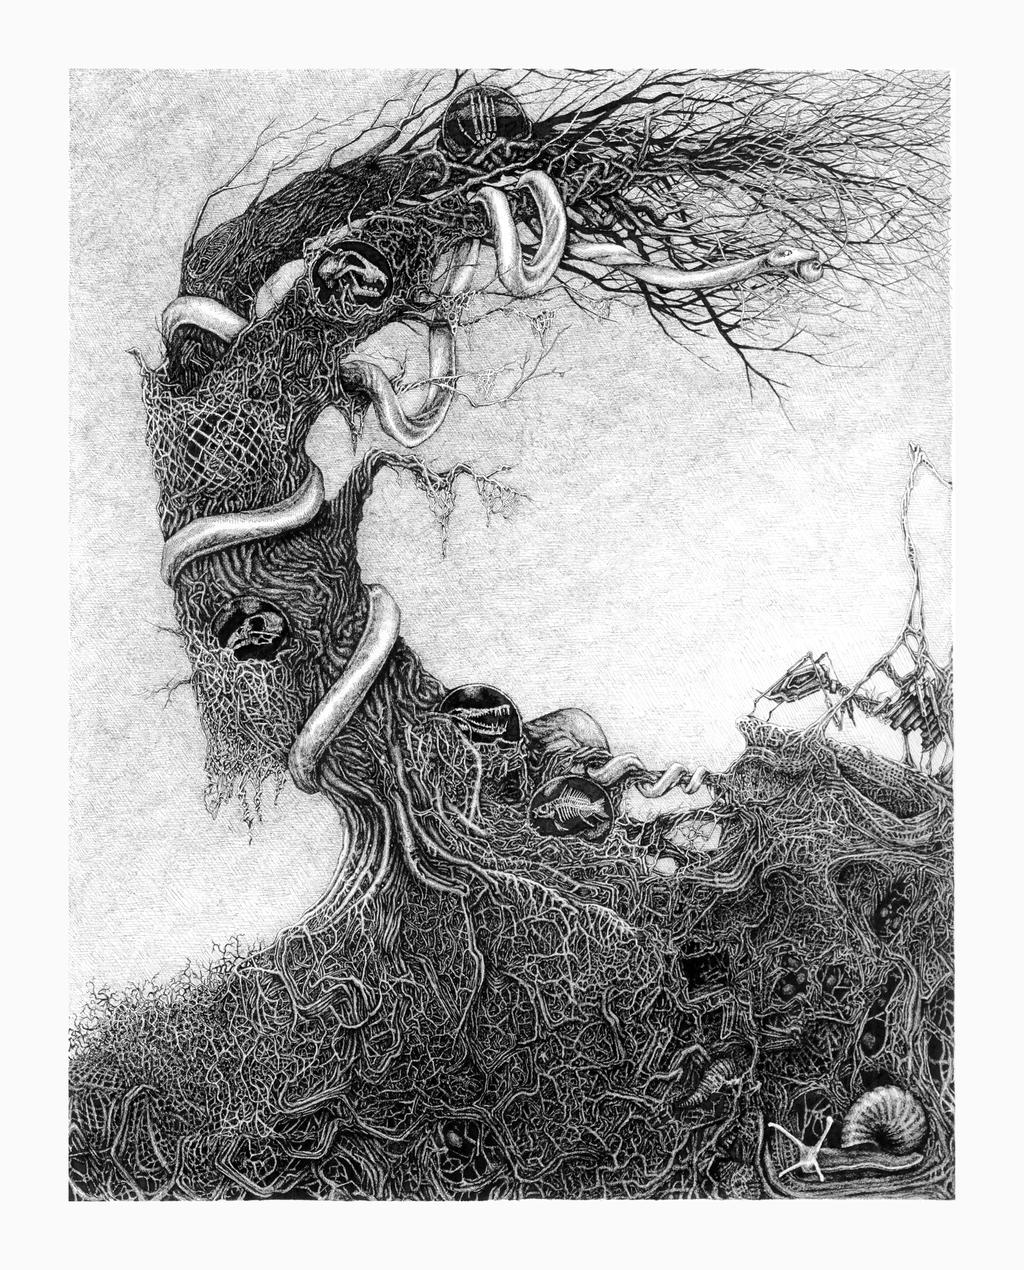 Yggdrasil Art Yggdrasil by dennisdon...